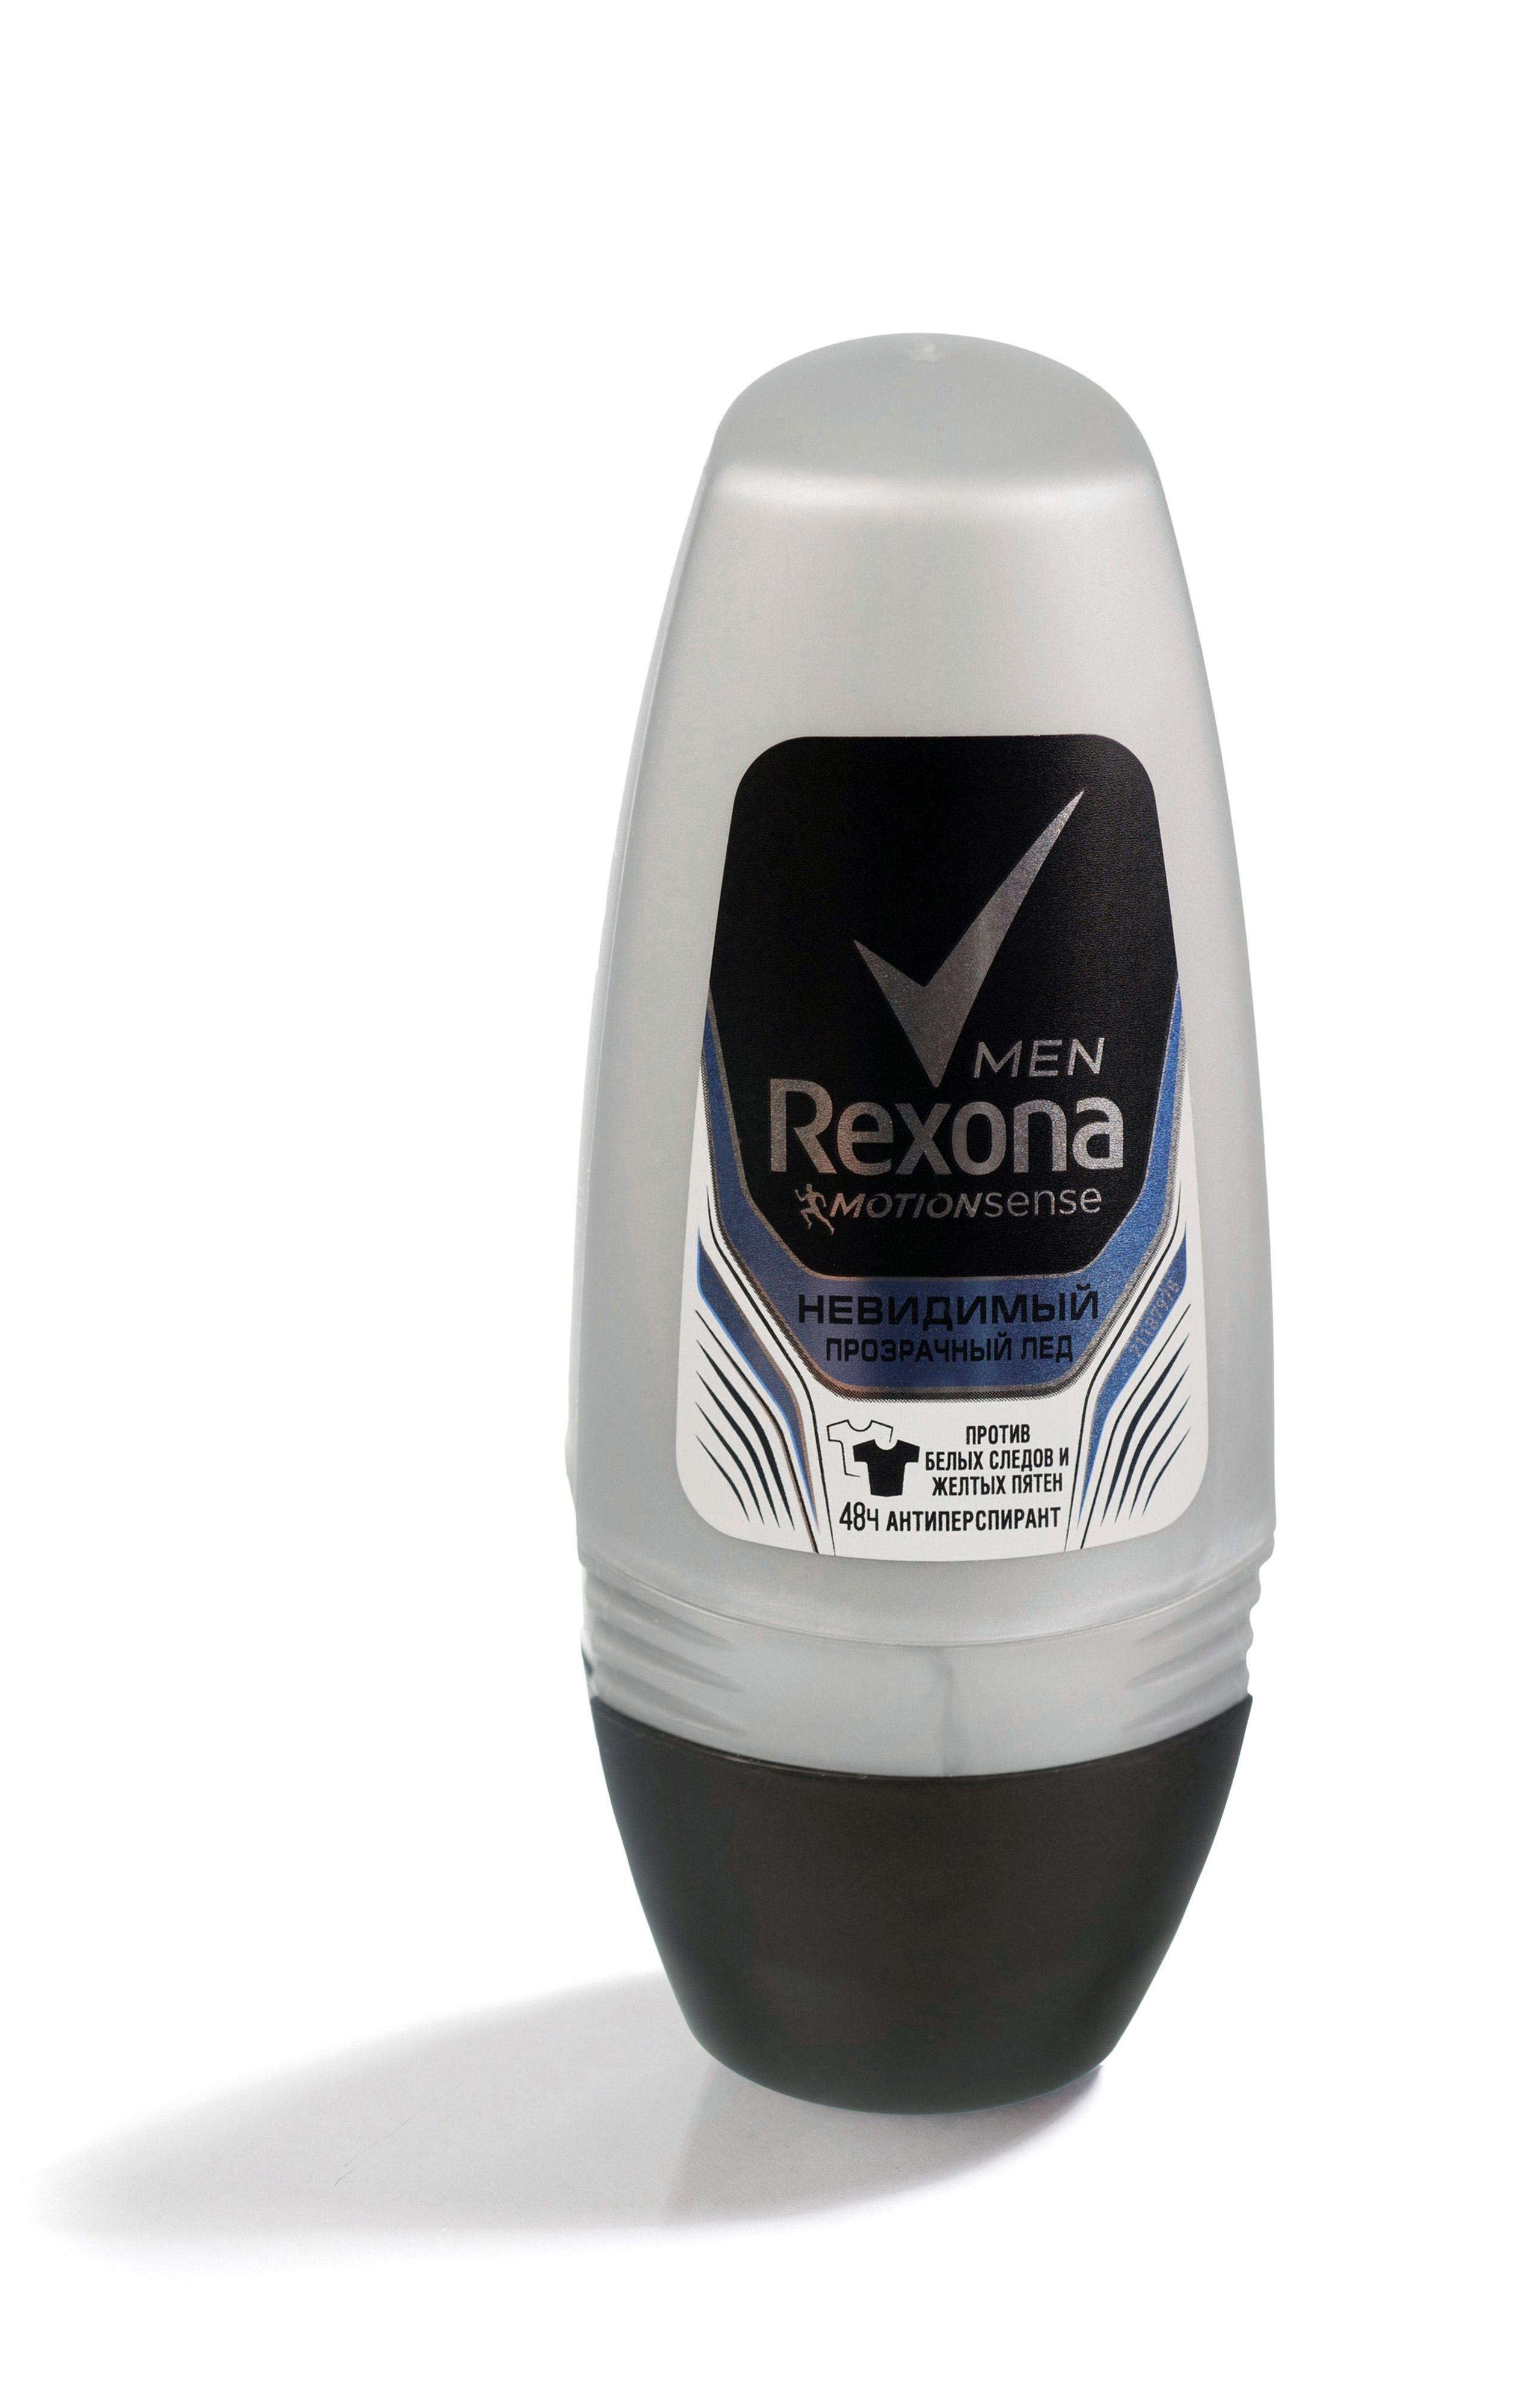 Rexona Men Motionsense Антиперспирант ролл Прозрачный лед 50 мл